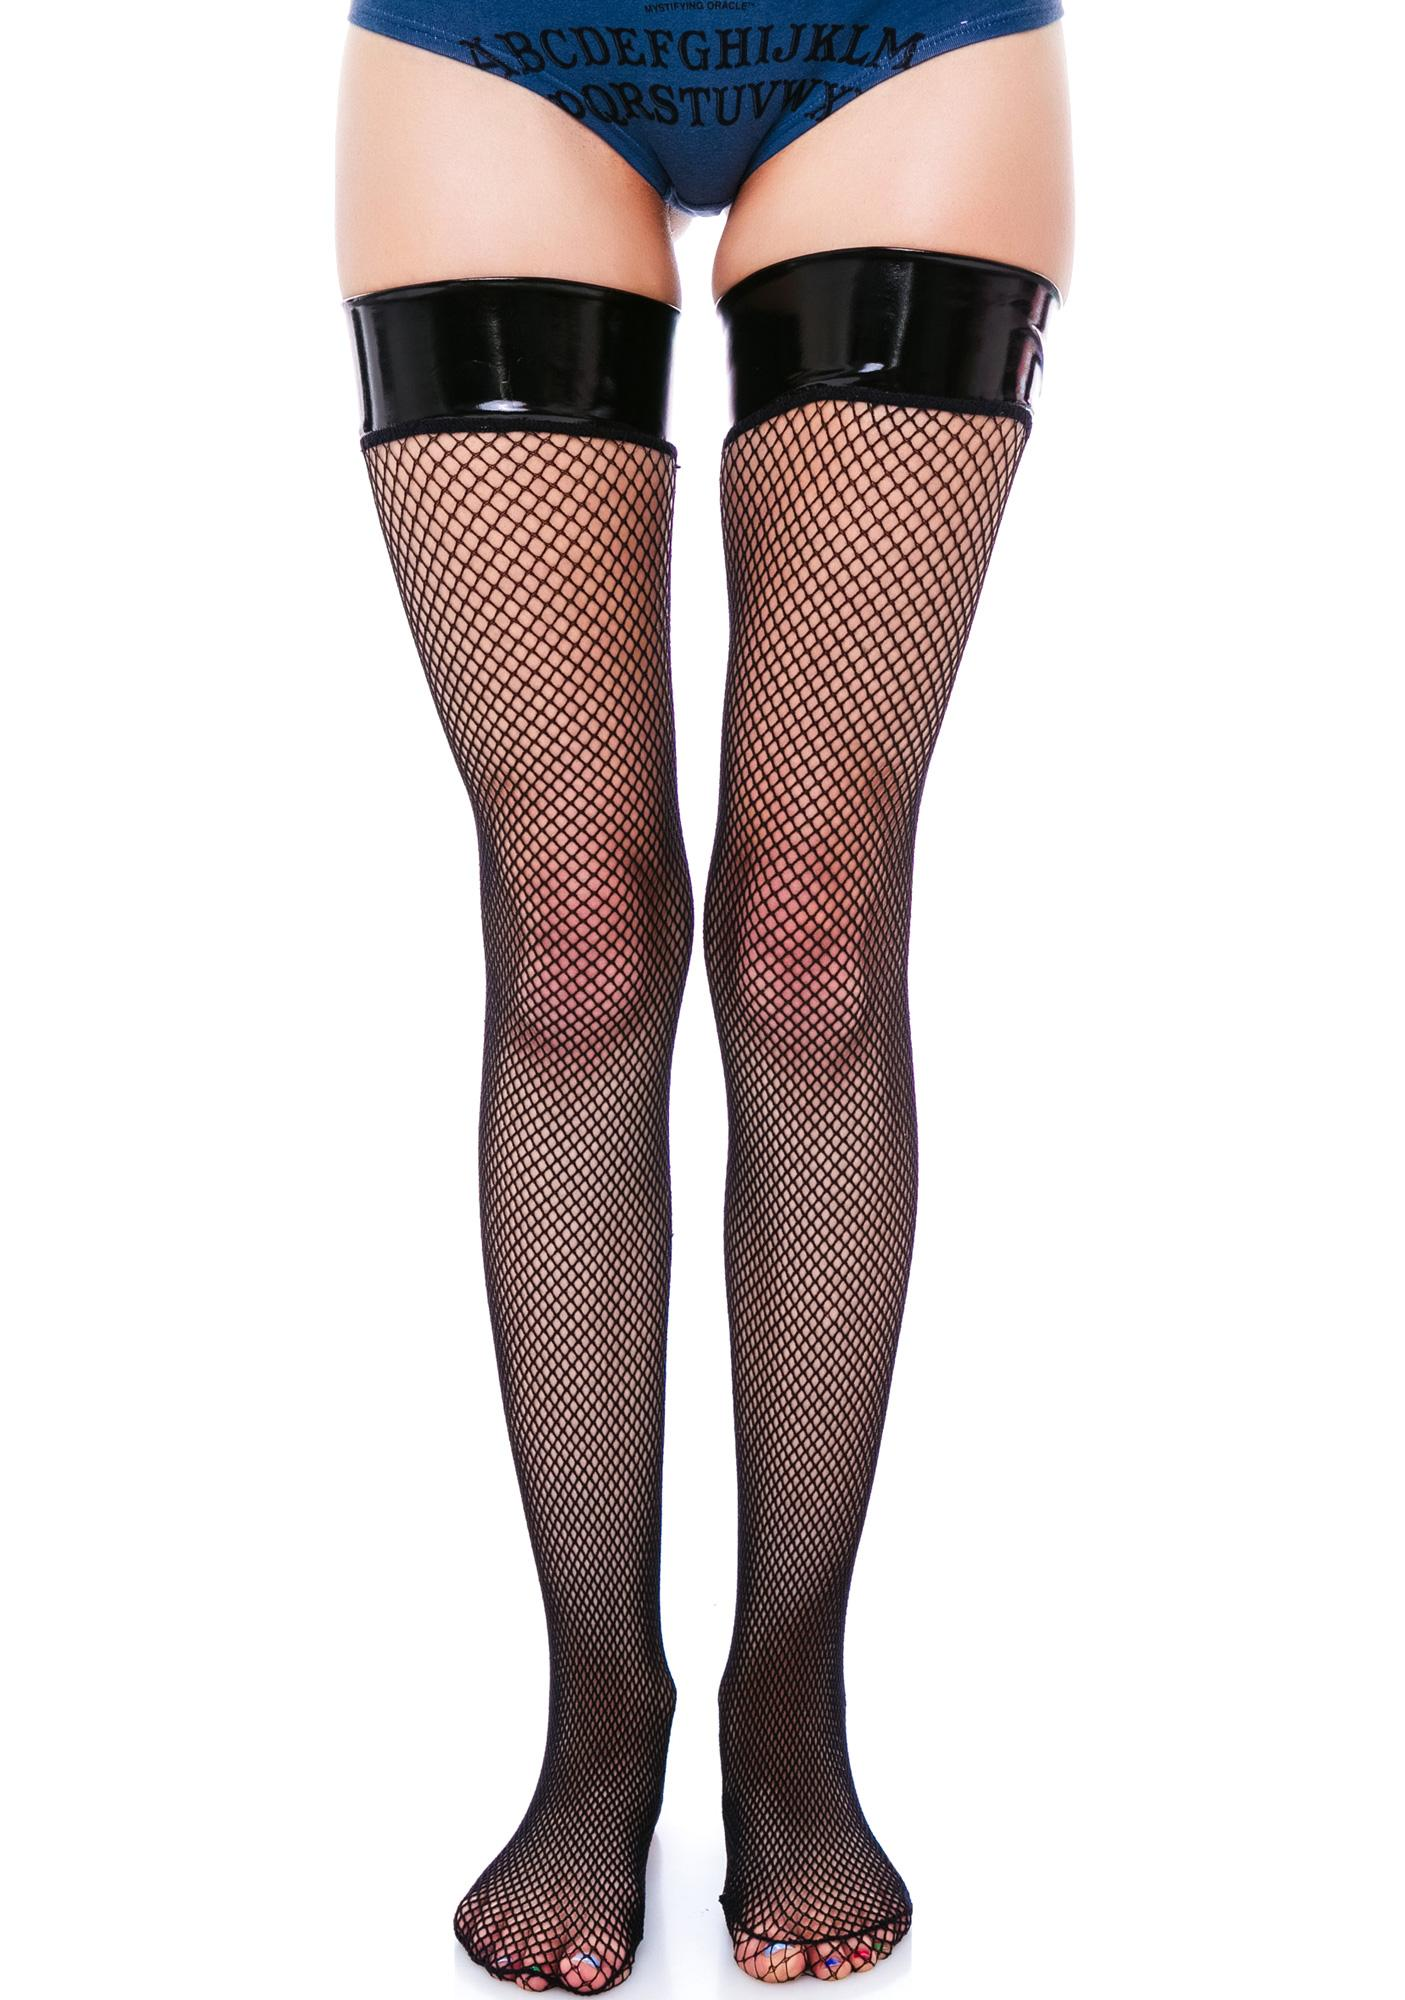 Madame Midnight Thigh High Fishnet Stockings